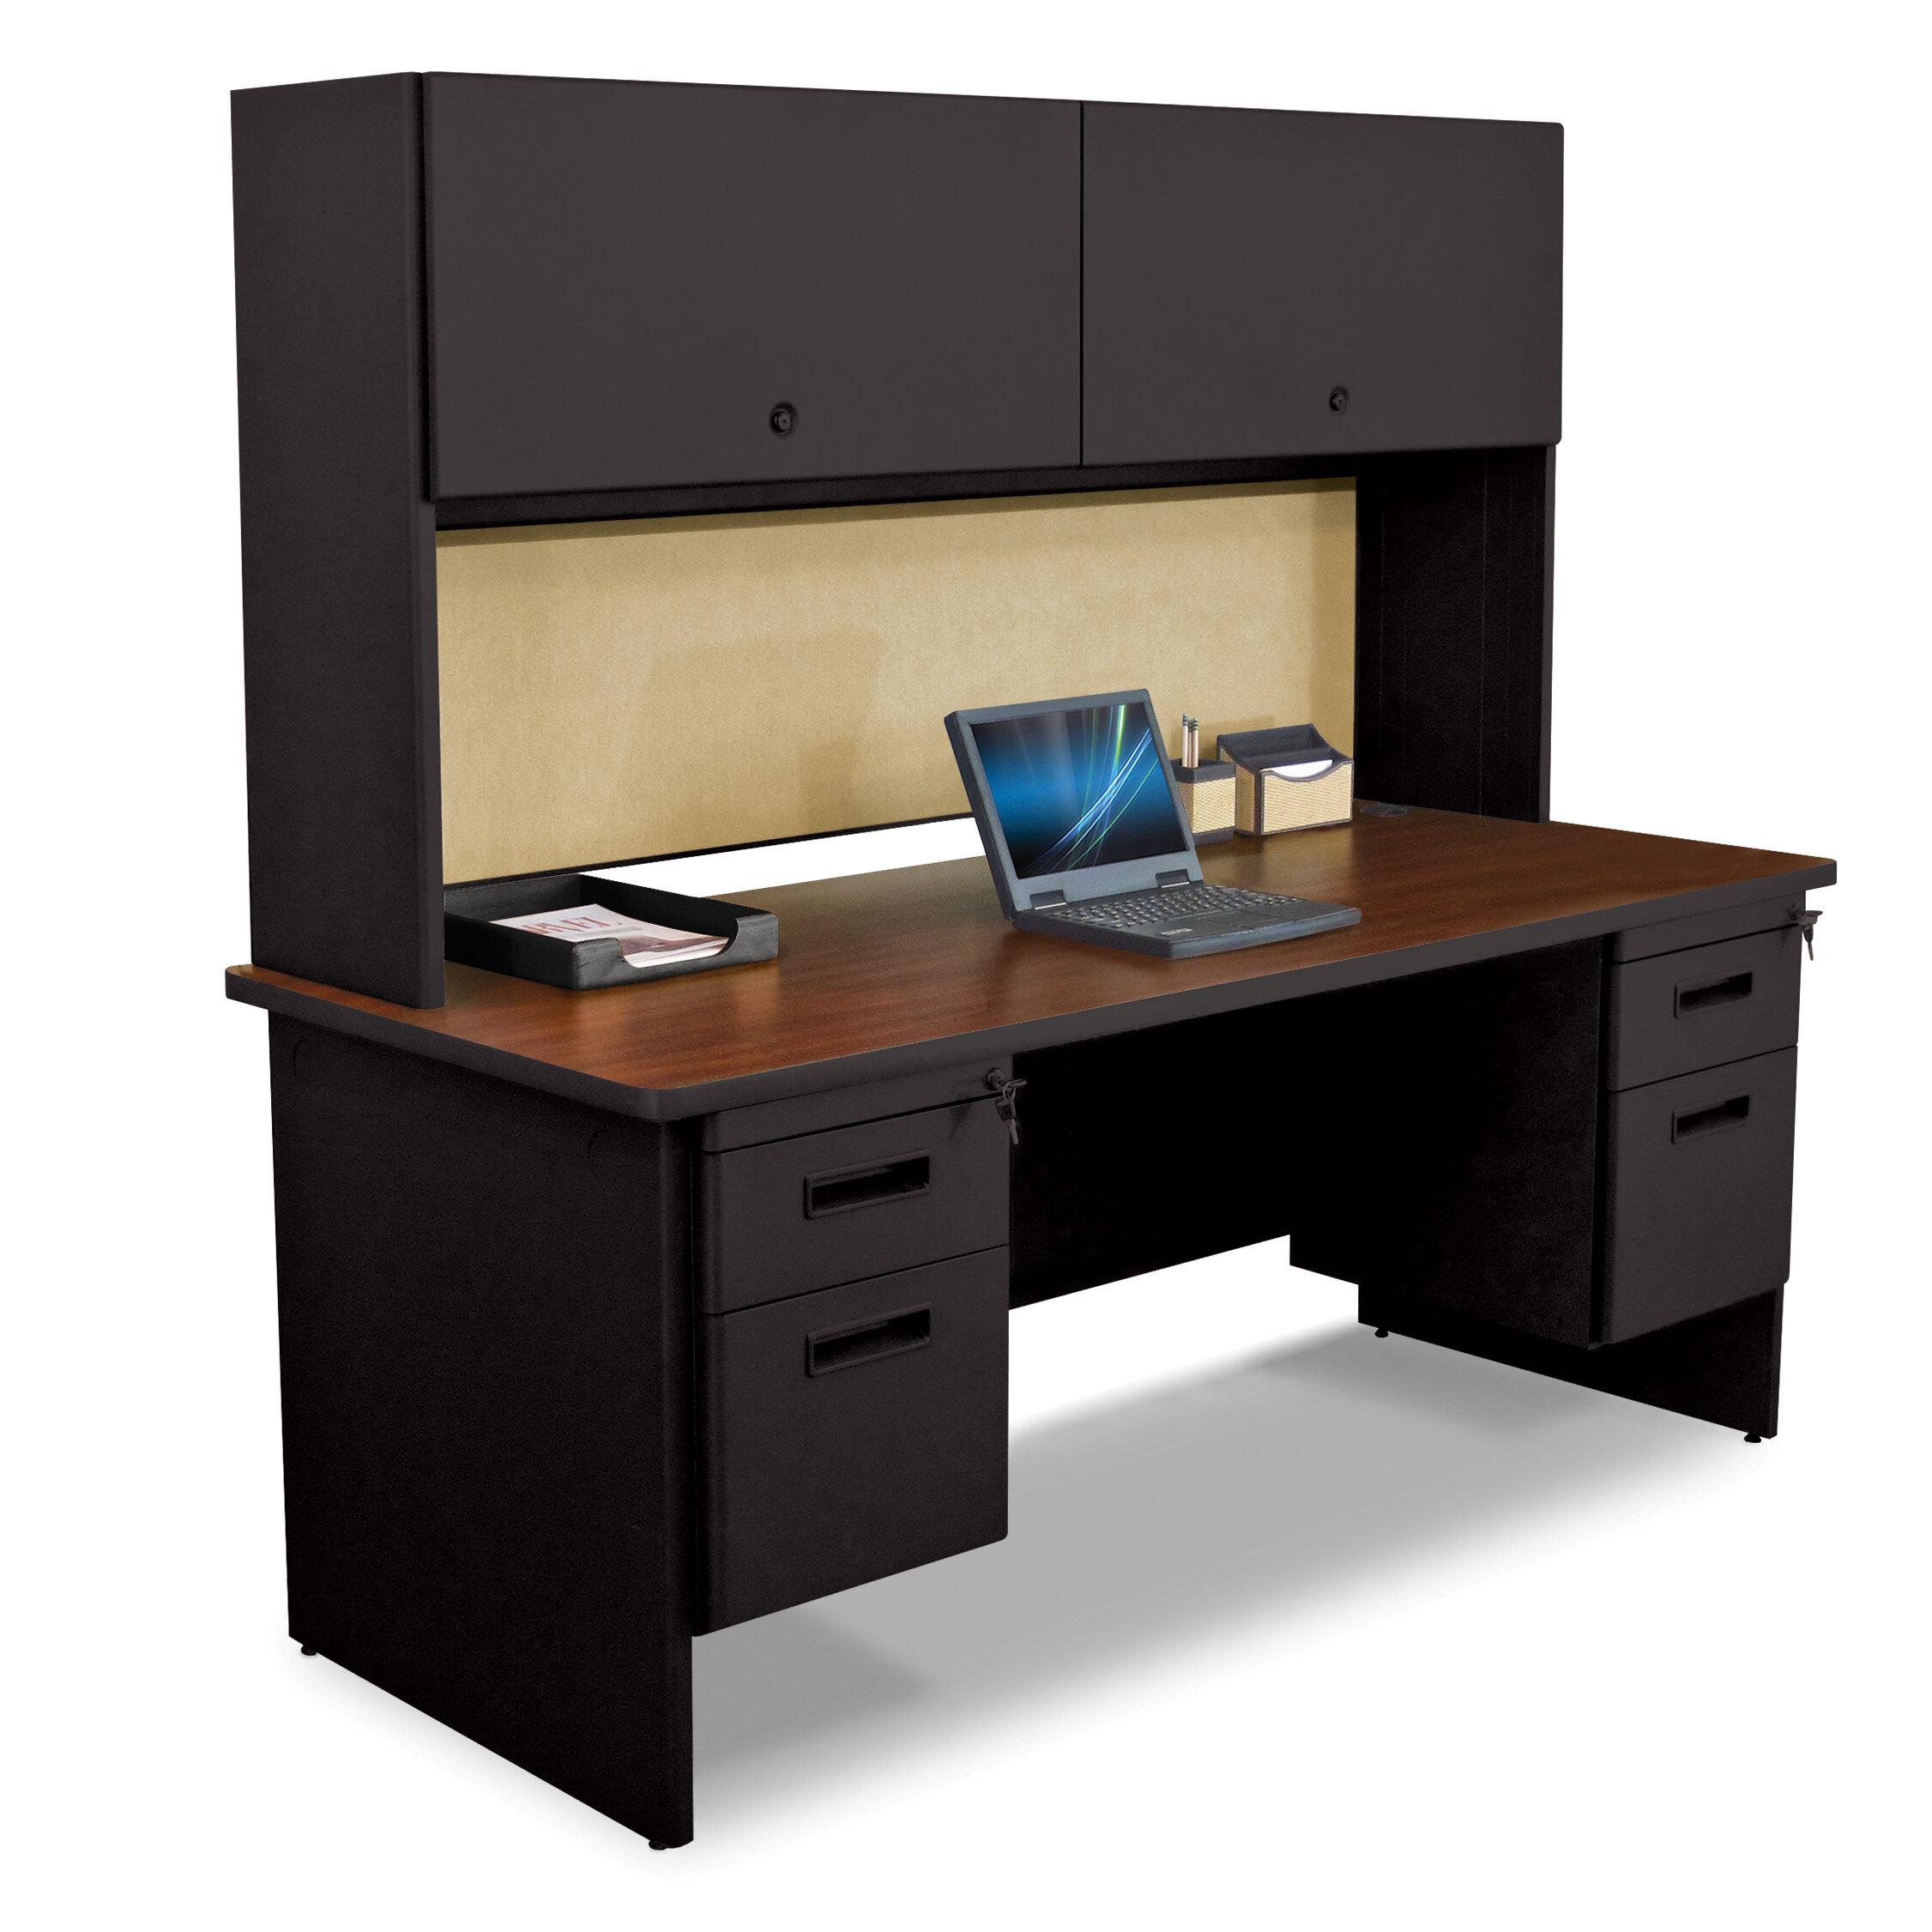 Crivello Flipper Door Cabinet and 42 Pedestal Computer Desk with Hutch